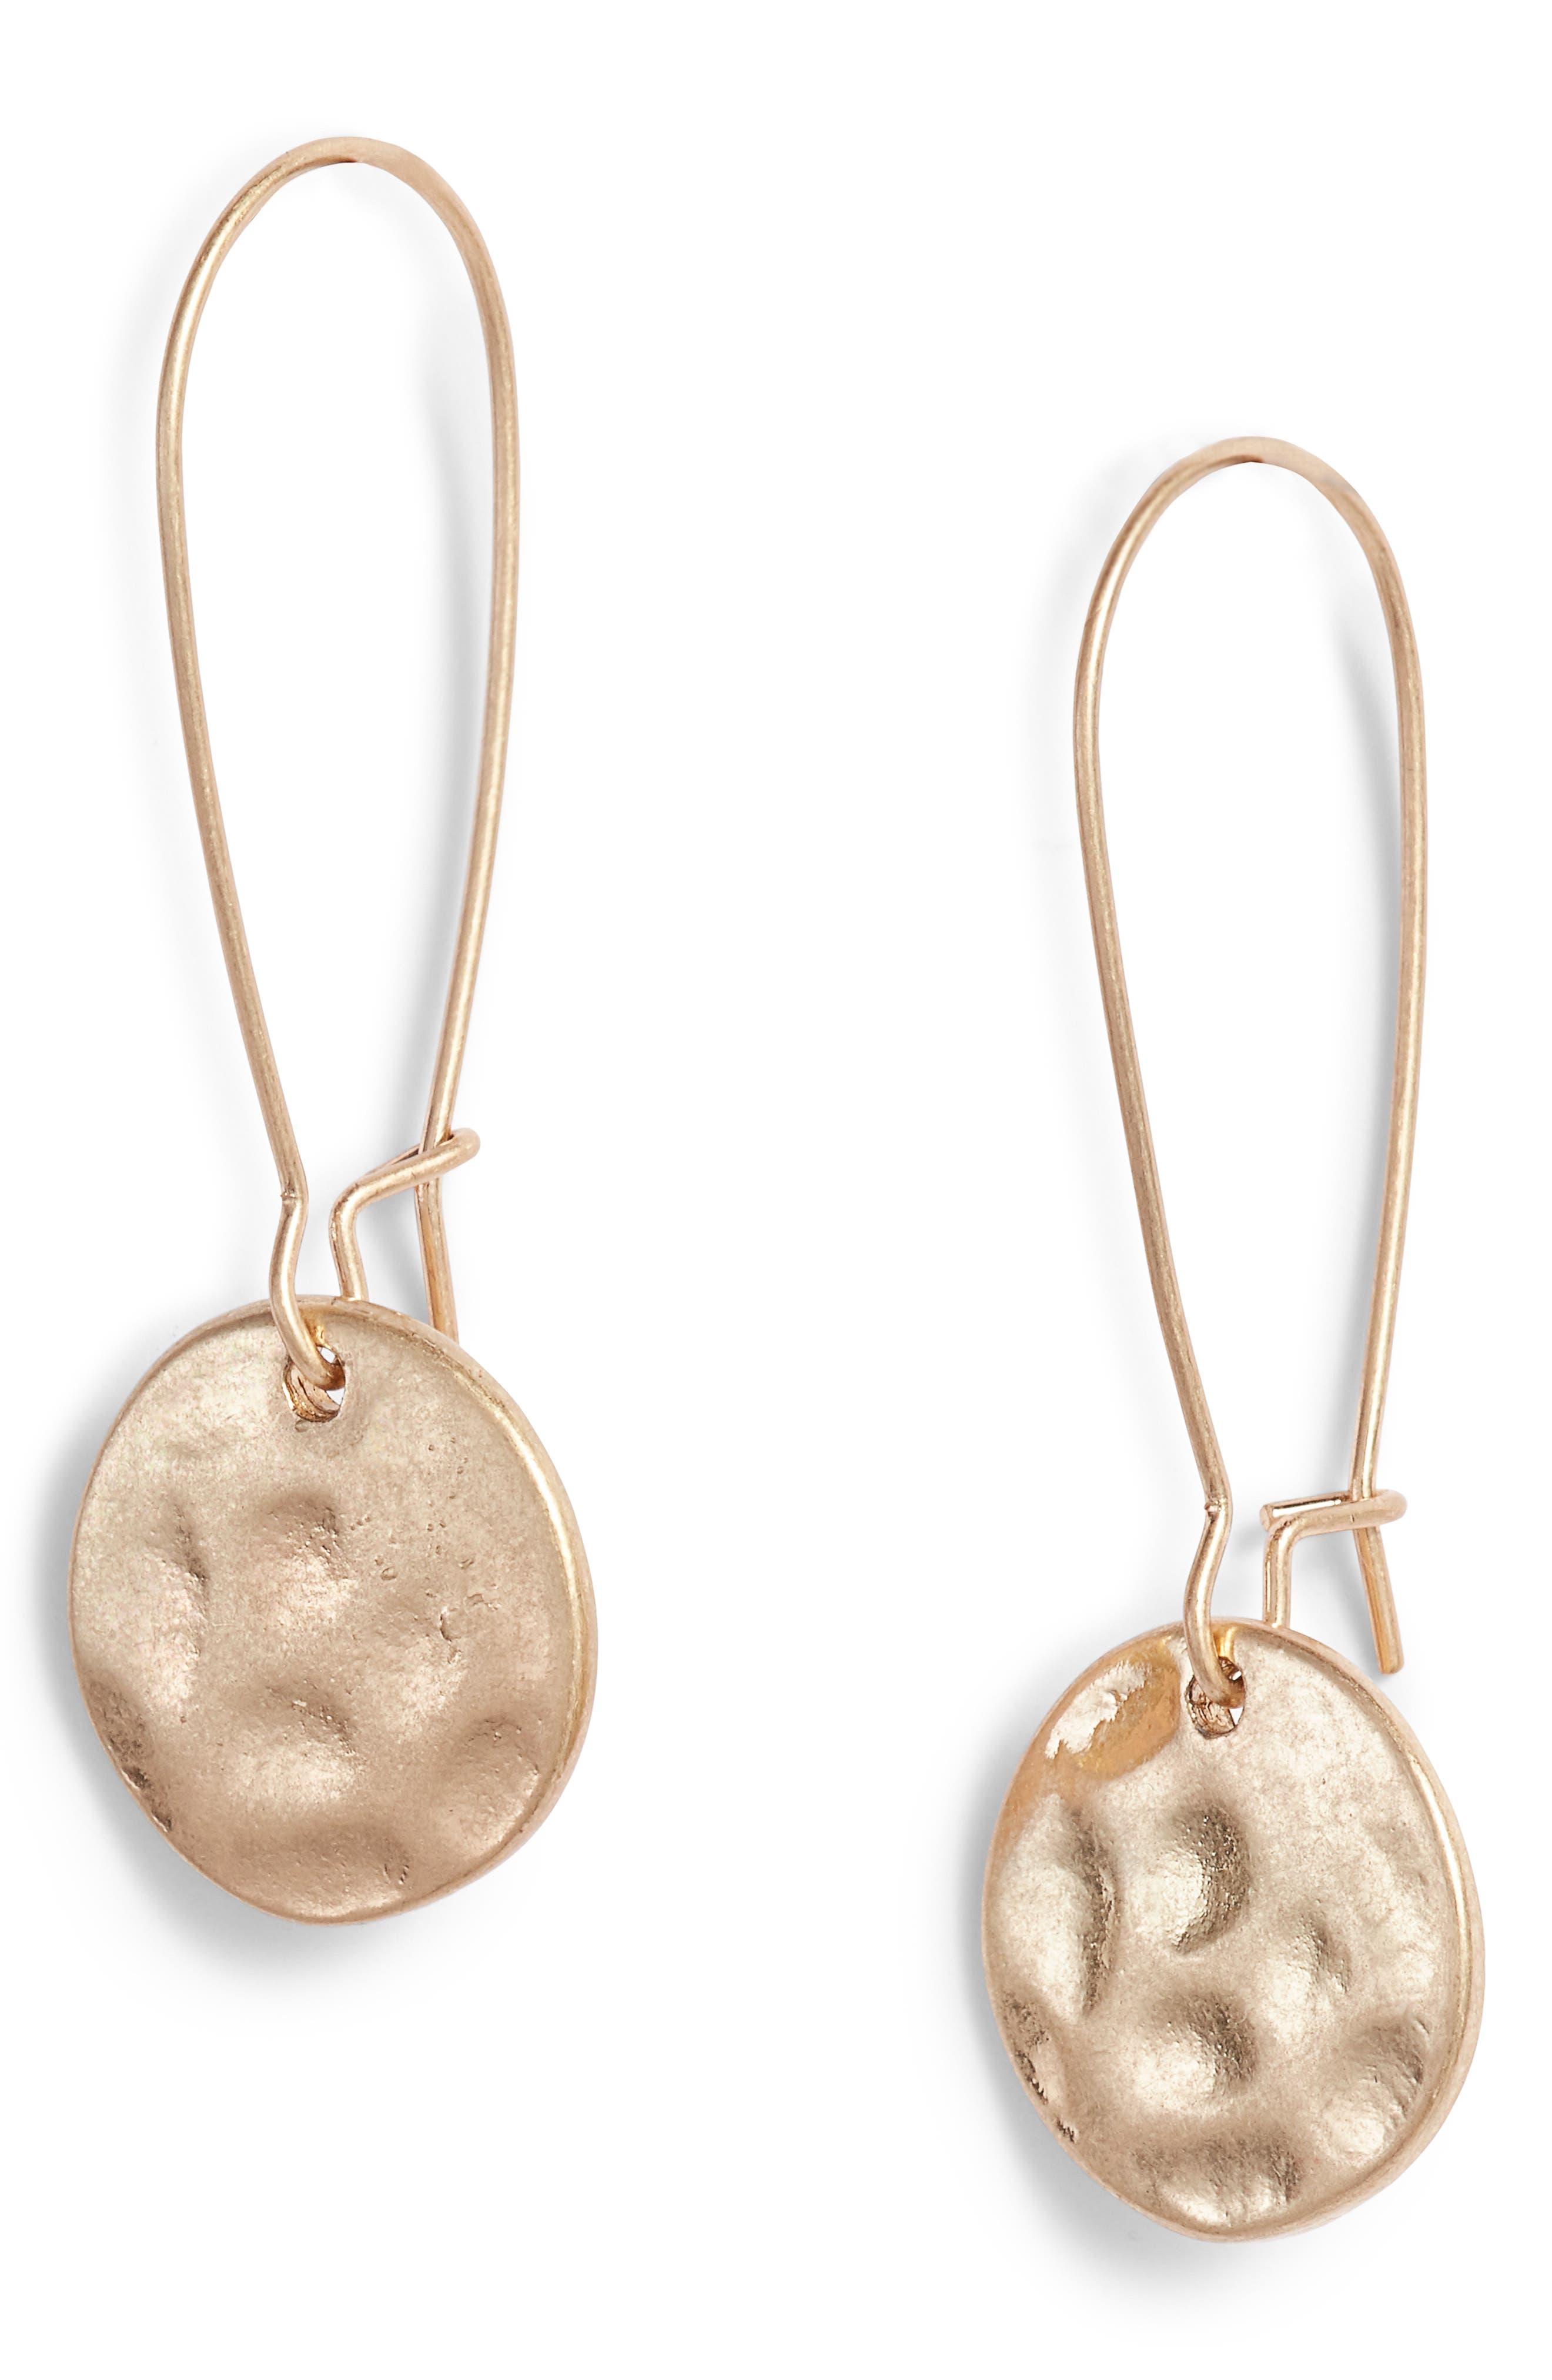 Organic Disc Threaded Drop Earrings,                             Main thumbnail 1, color,                             Gold